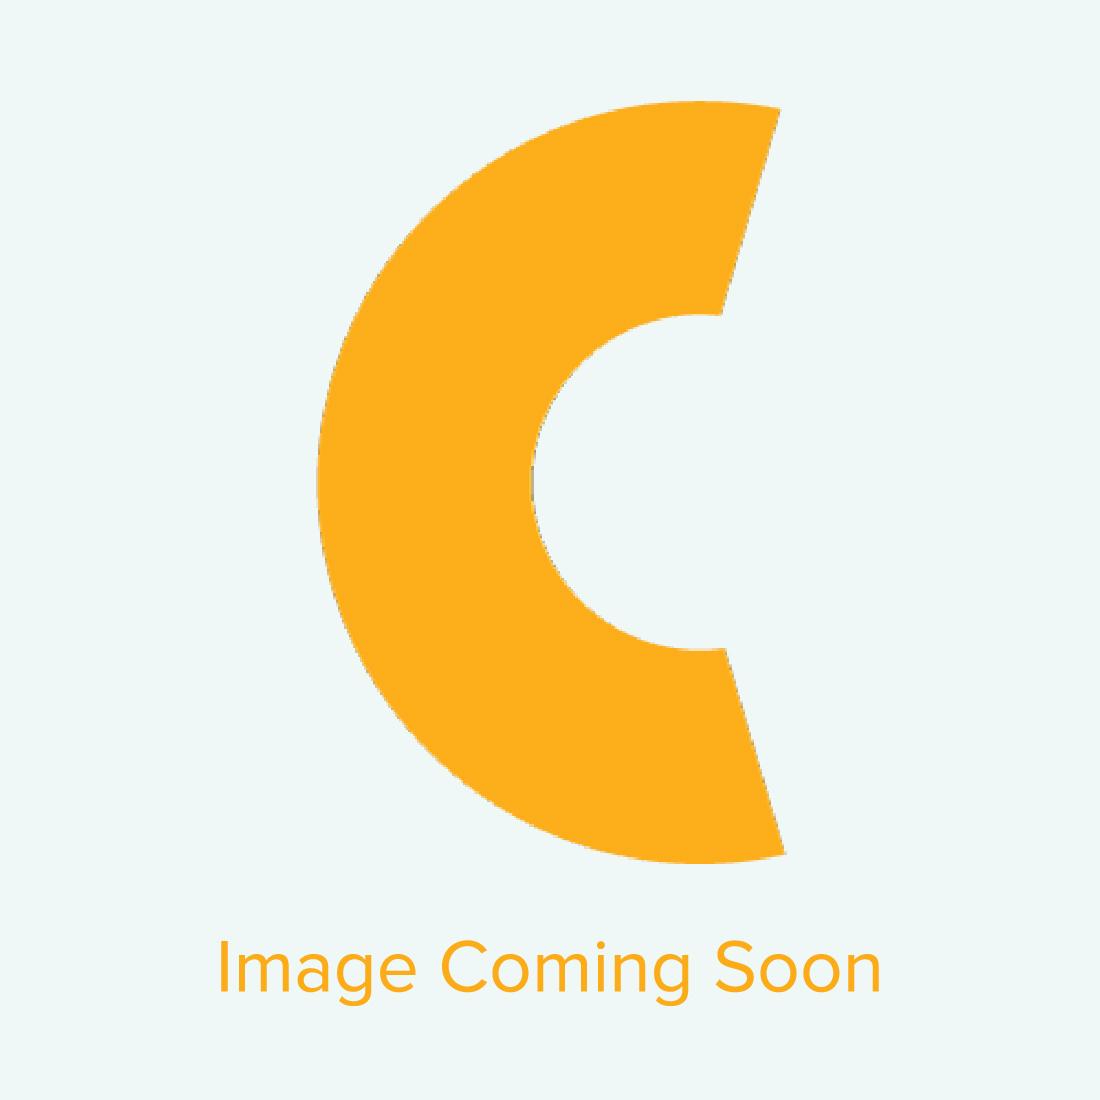 "Epson SureColor F9200 64"" Wide Format Dye Sublimation Printer - DEMO MODEL - CALL FOR DETAILS"